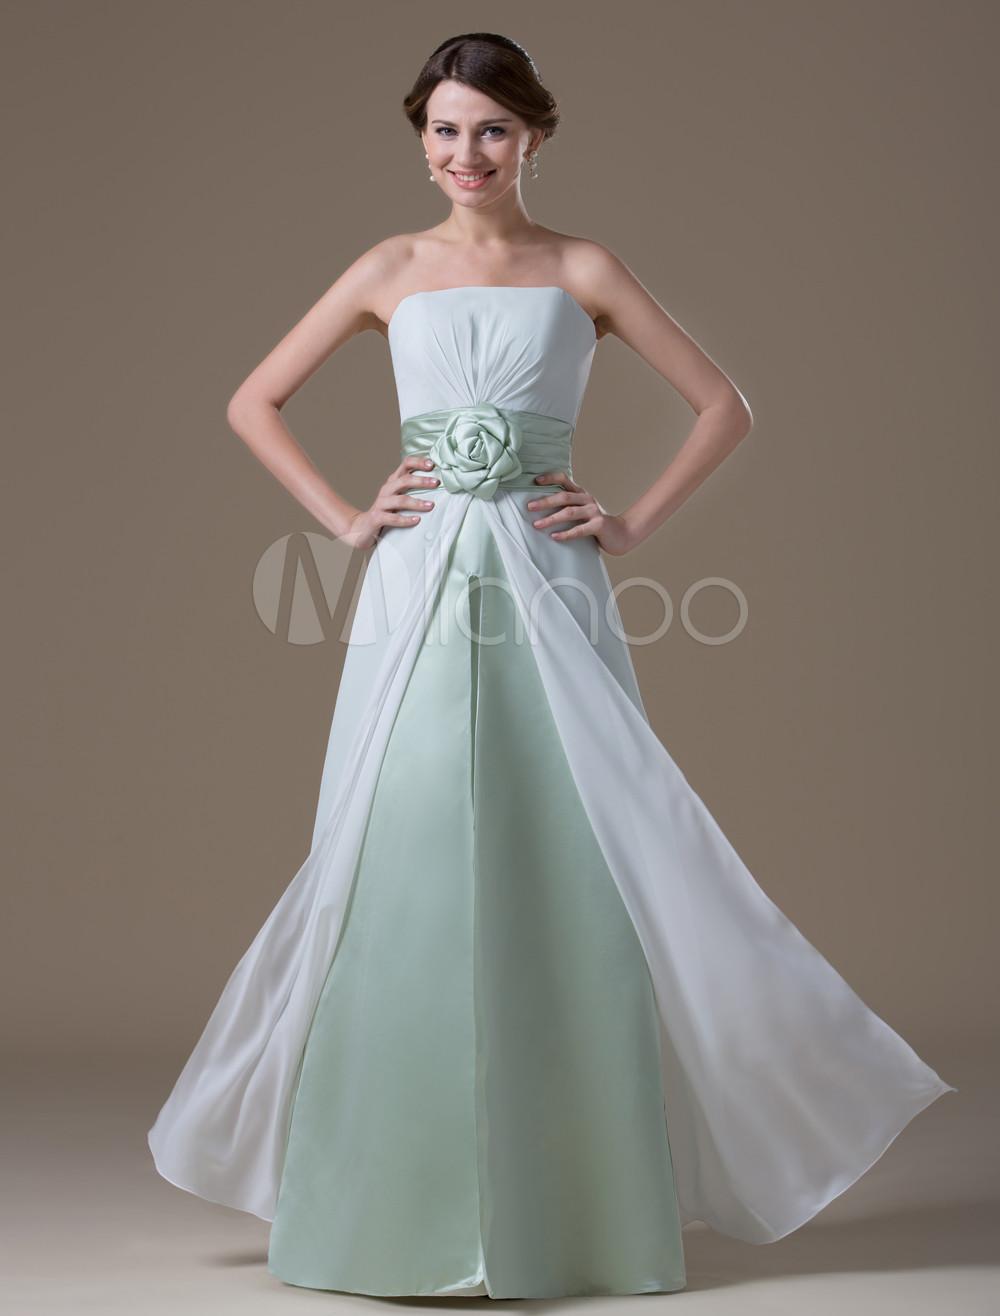 1e1316bf3c4 Pretty White Chiffon Strapless Floor Length Maternity Bridesmaid ...